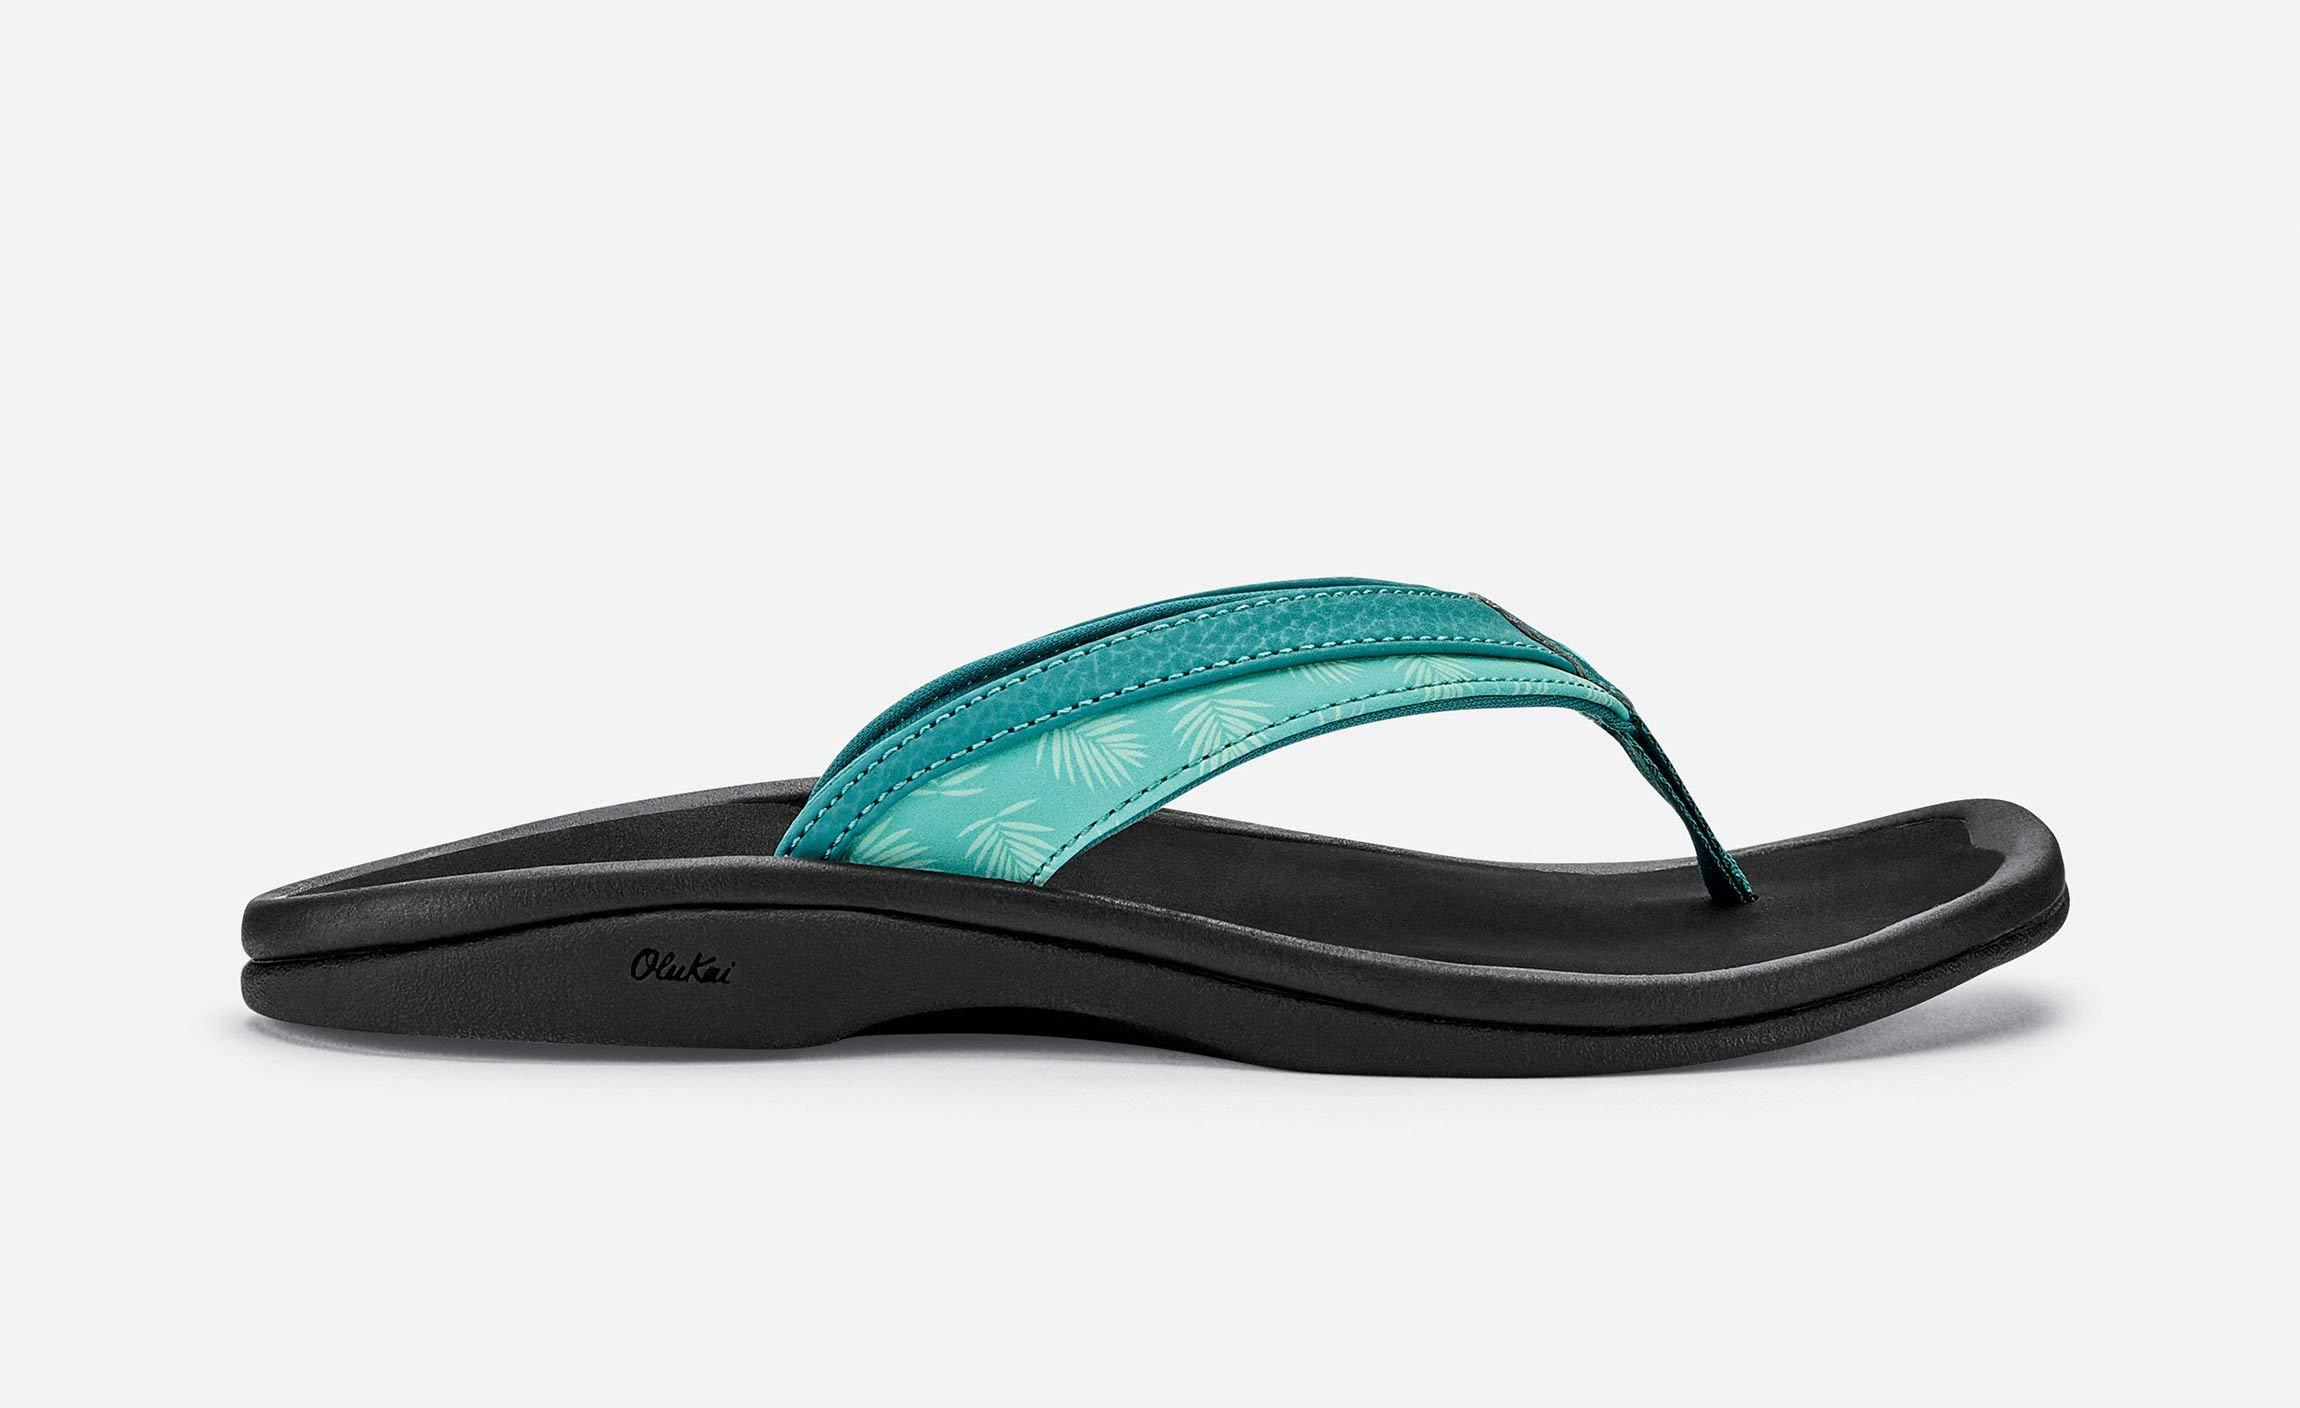 OLUKAI Ohana Sandals - Women's Paradise/Black 8